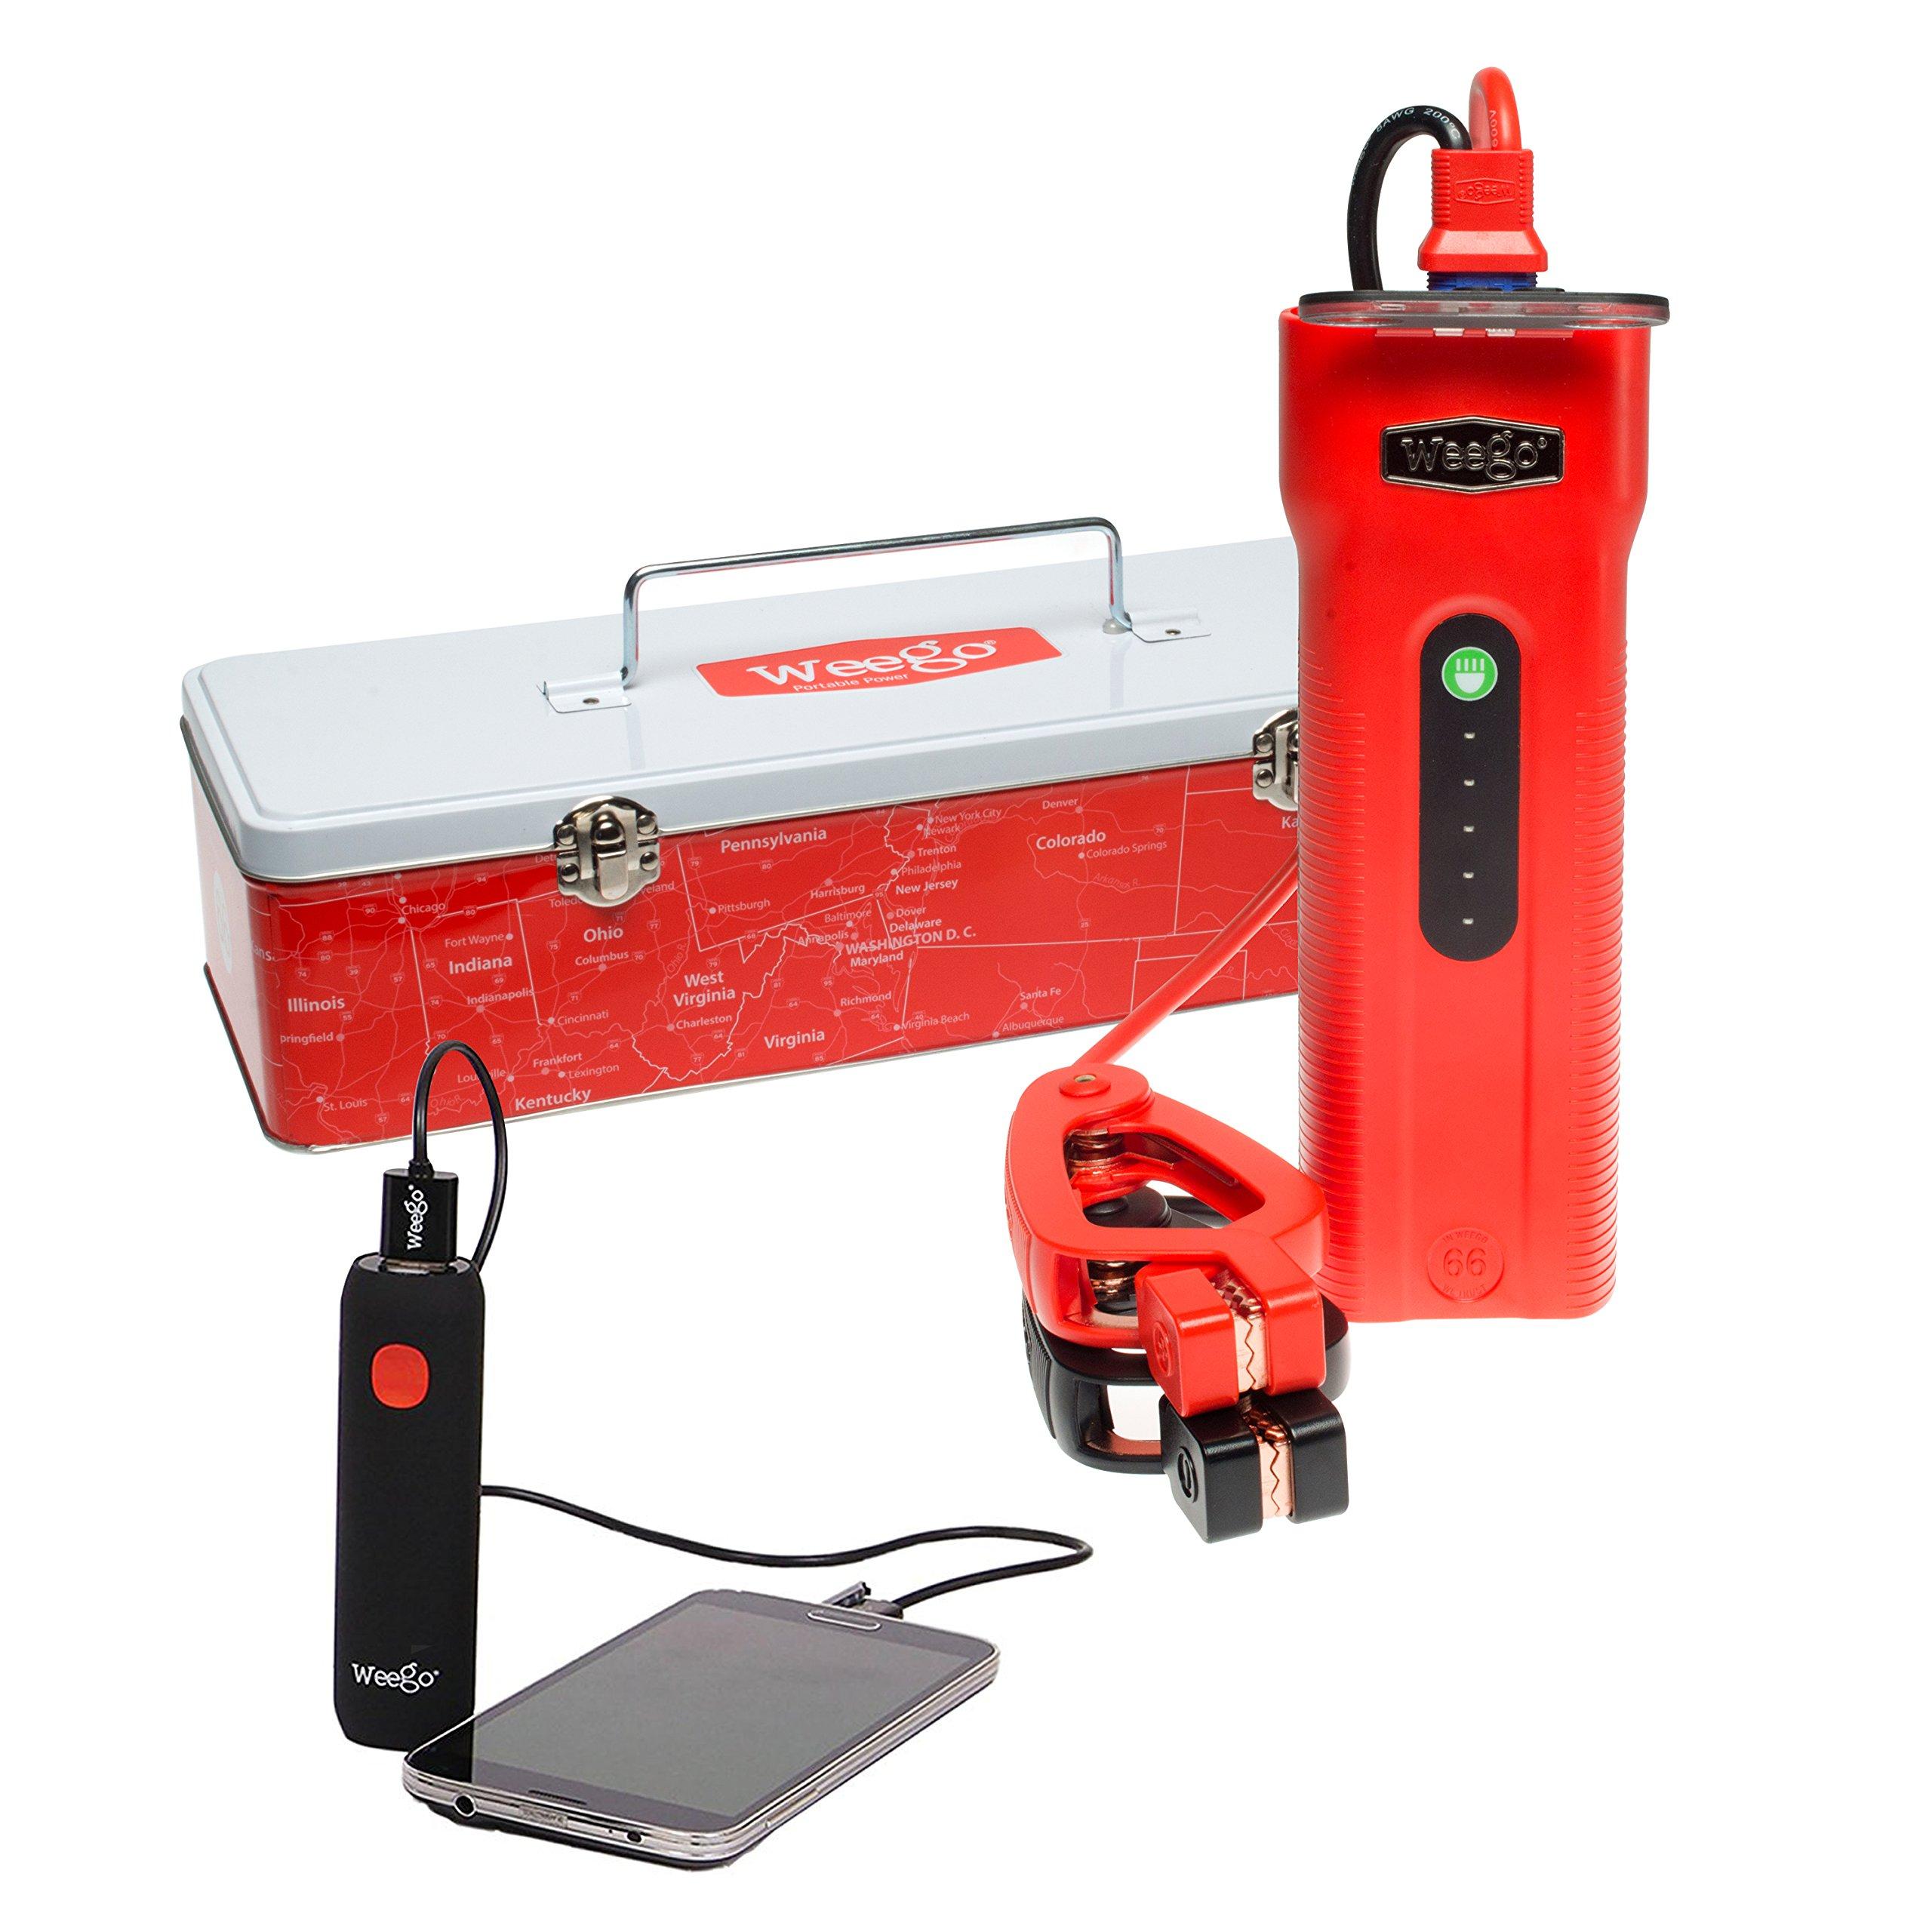 Weego Jump Starter 66 with Bonus Battery Pack, Award-Winning, USA-Designed & Engineered, Lithium-ion, Jump Starts 10L Gas & 5L Diesel Engines-Charges Phones, Laptops& 36 Hr 600 Lumen Light